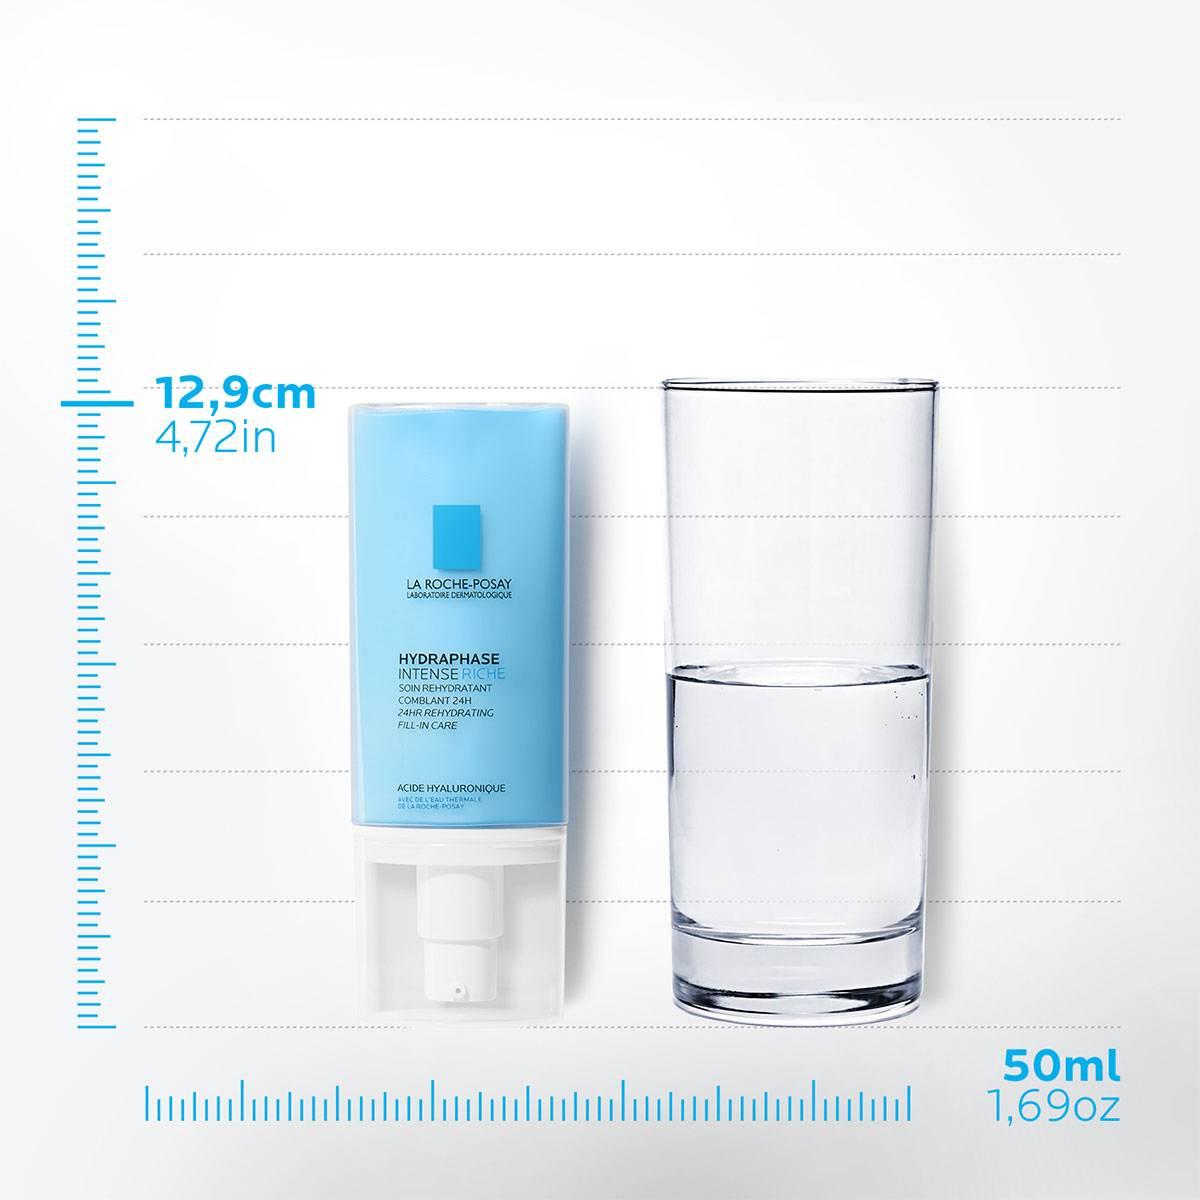 Hydraphase Intense Rich 50 ml | La Roche Posay